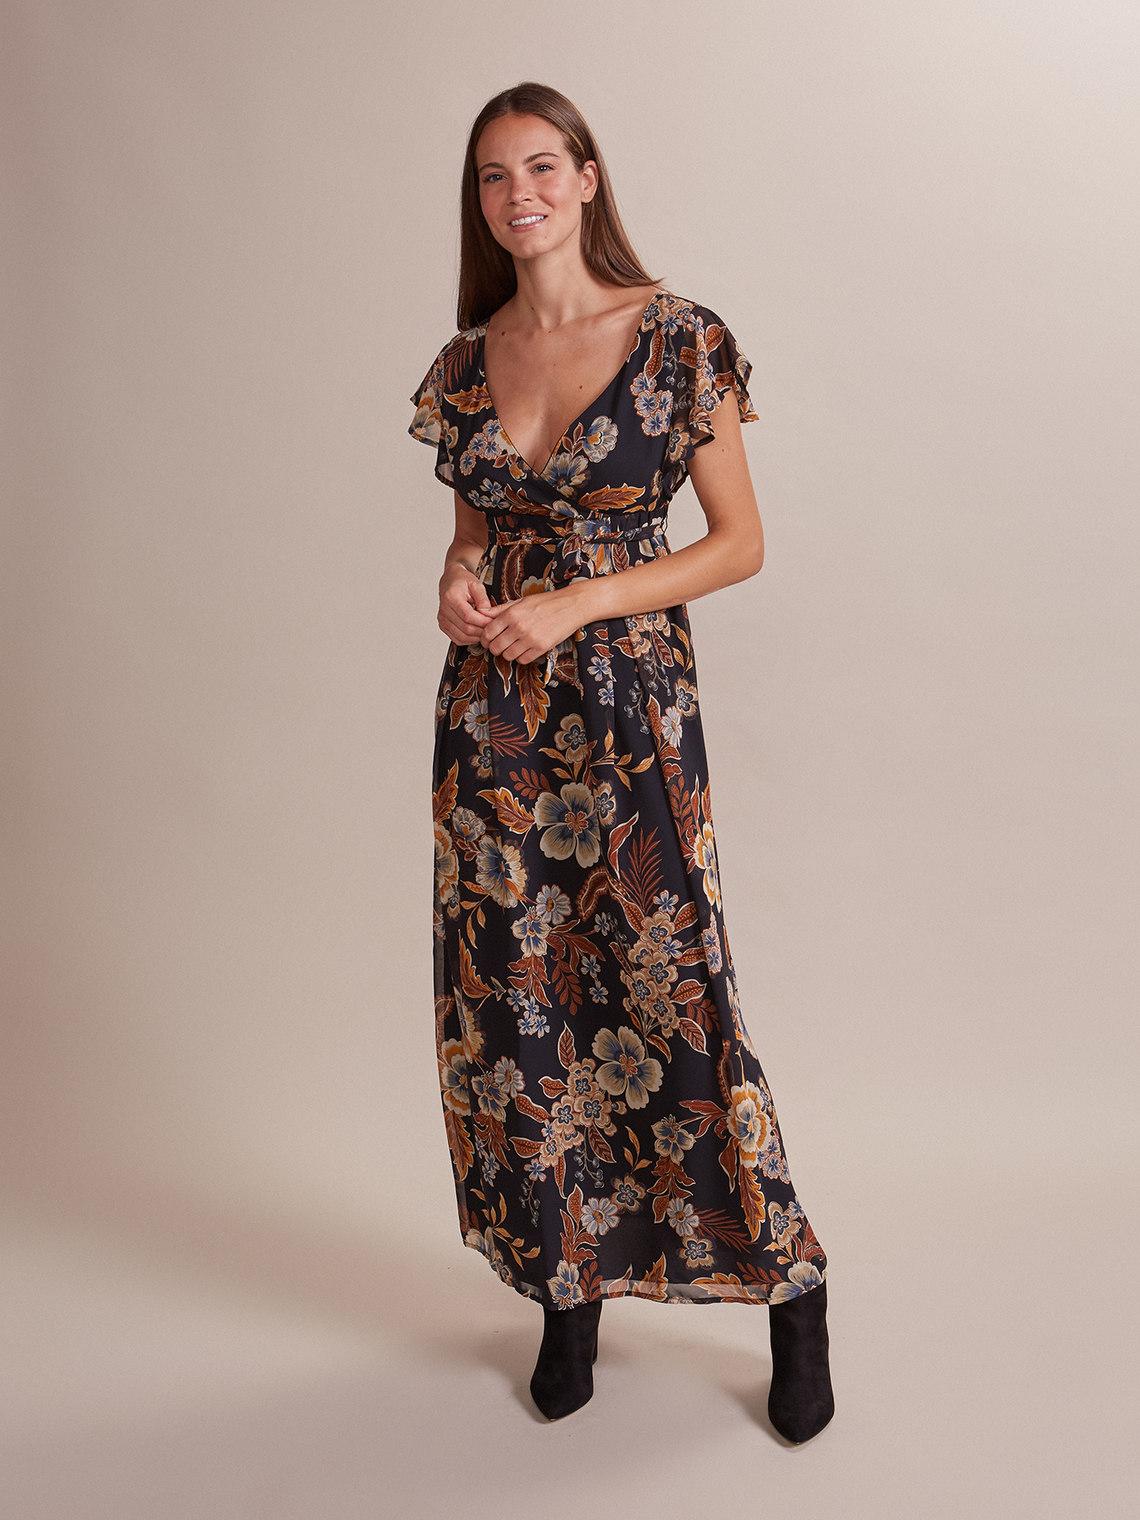 low priced 7b166 eec6b Vestito lungo fantasia floreale - Oltre.com